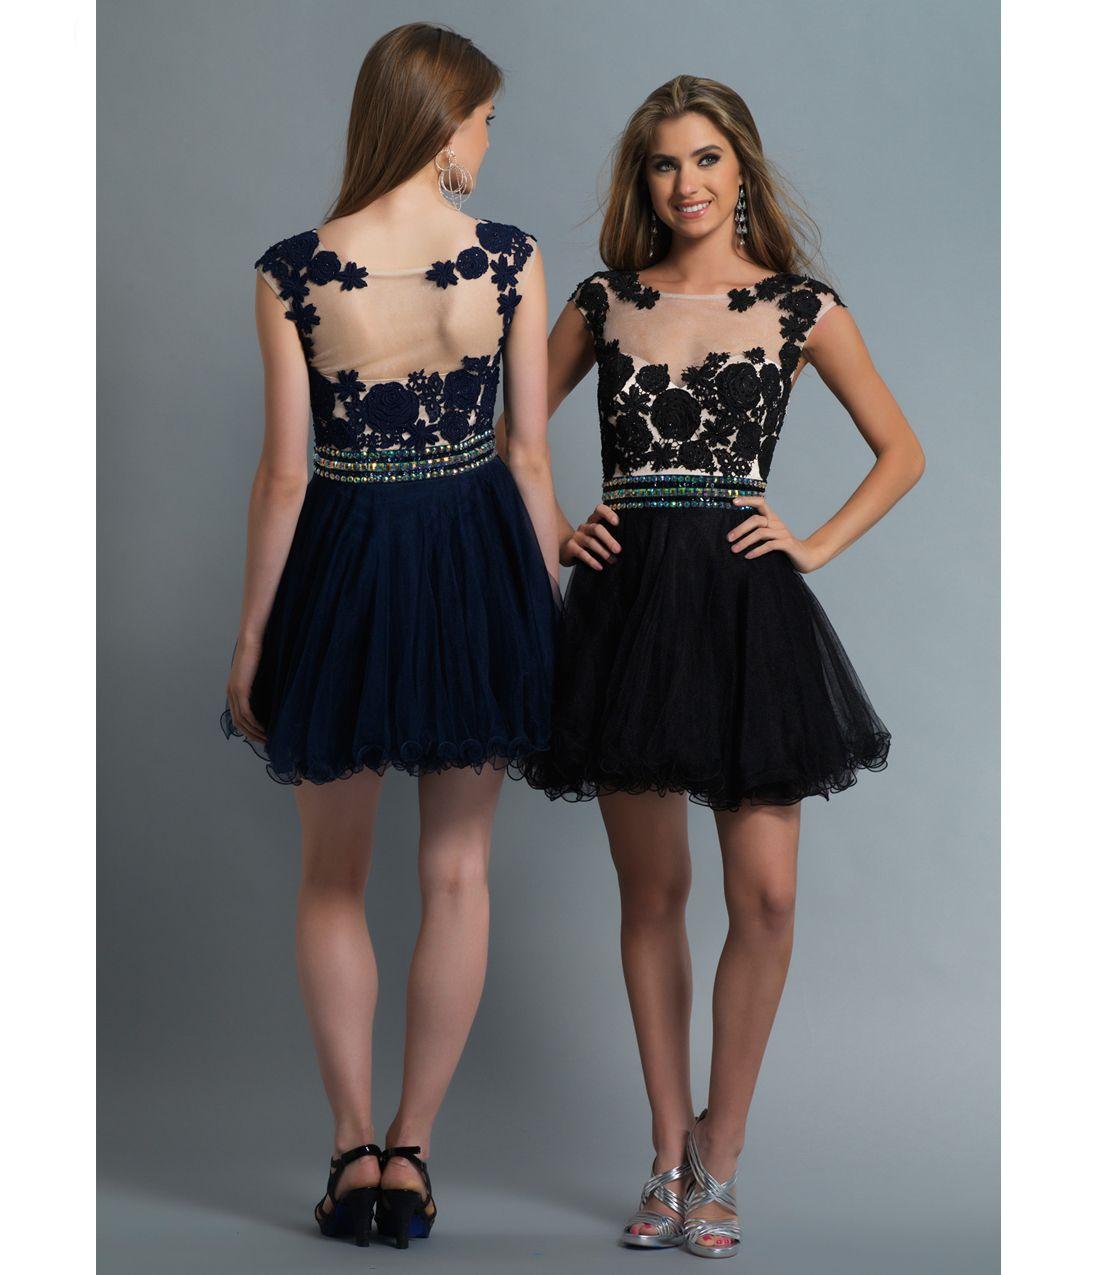 Dave u johnny black tulle u lace short dress prom dresses